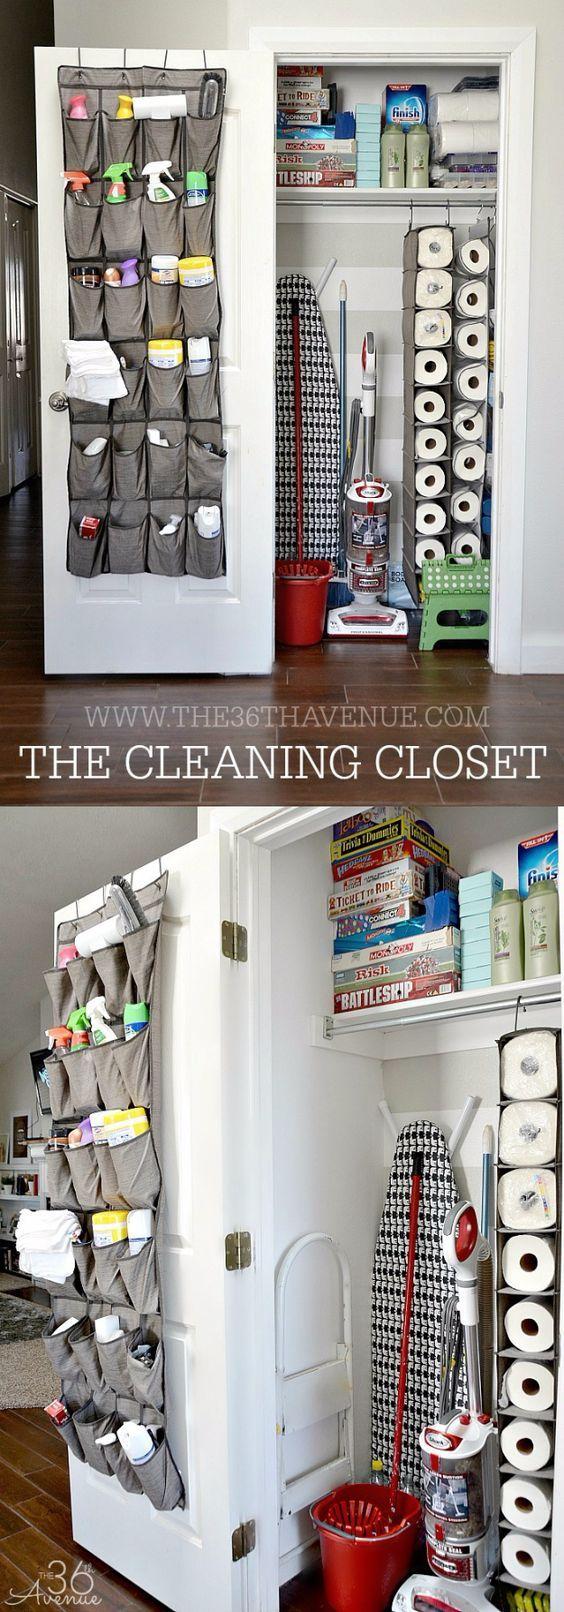 Best 25+ Best Way Toanize Closet Ideas On Pinterest  Maximize Closet  Space, Bedroomanization Tips And Closetanization Tips